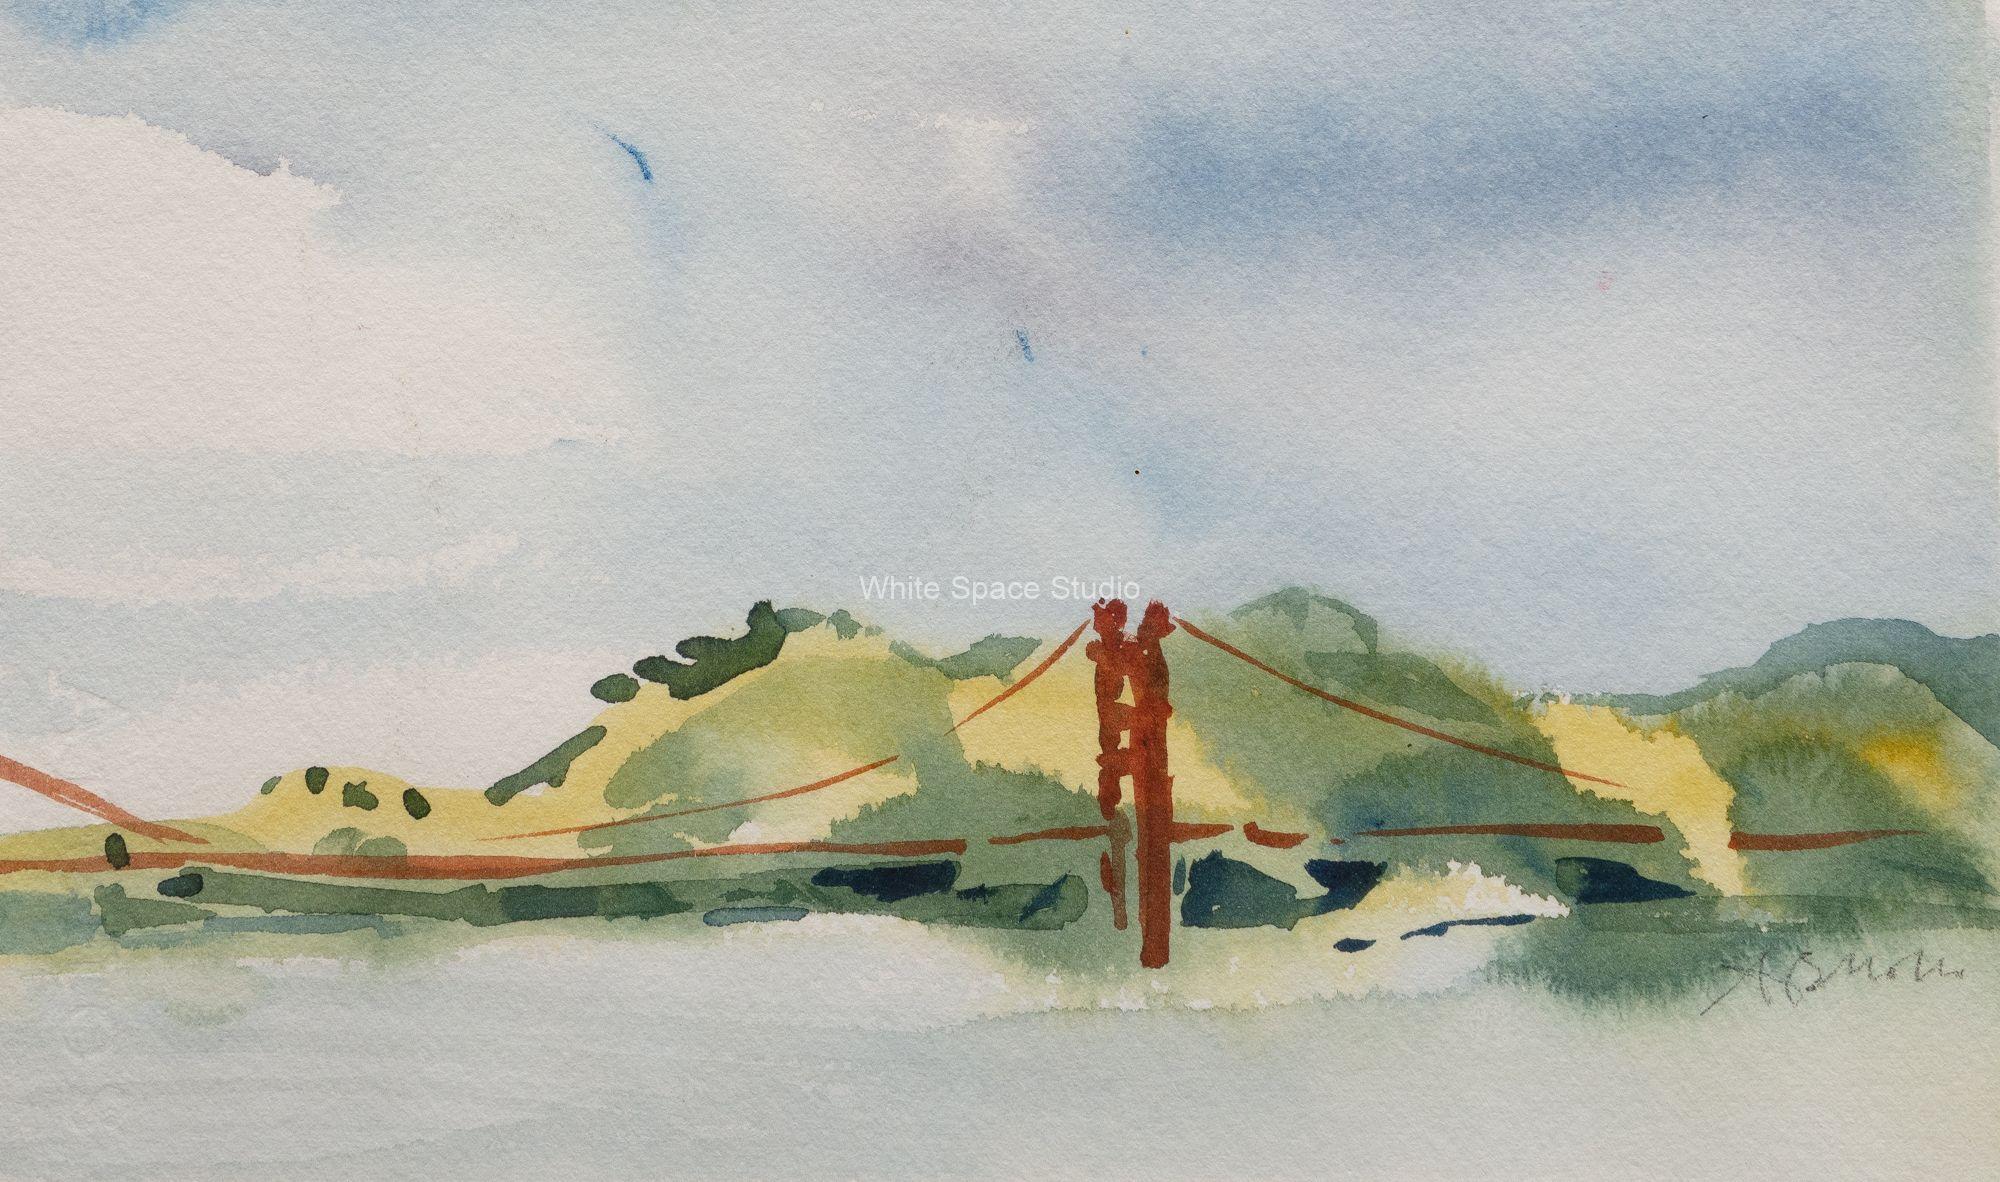 Golden Gate San Francisco Arlene Black Mollo Watercolor Artwork